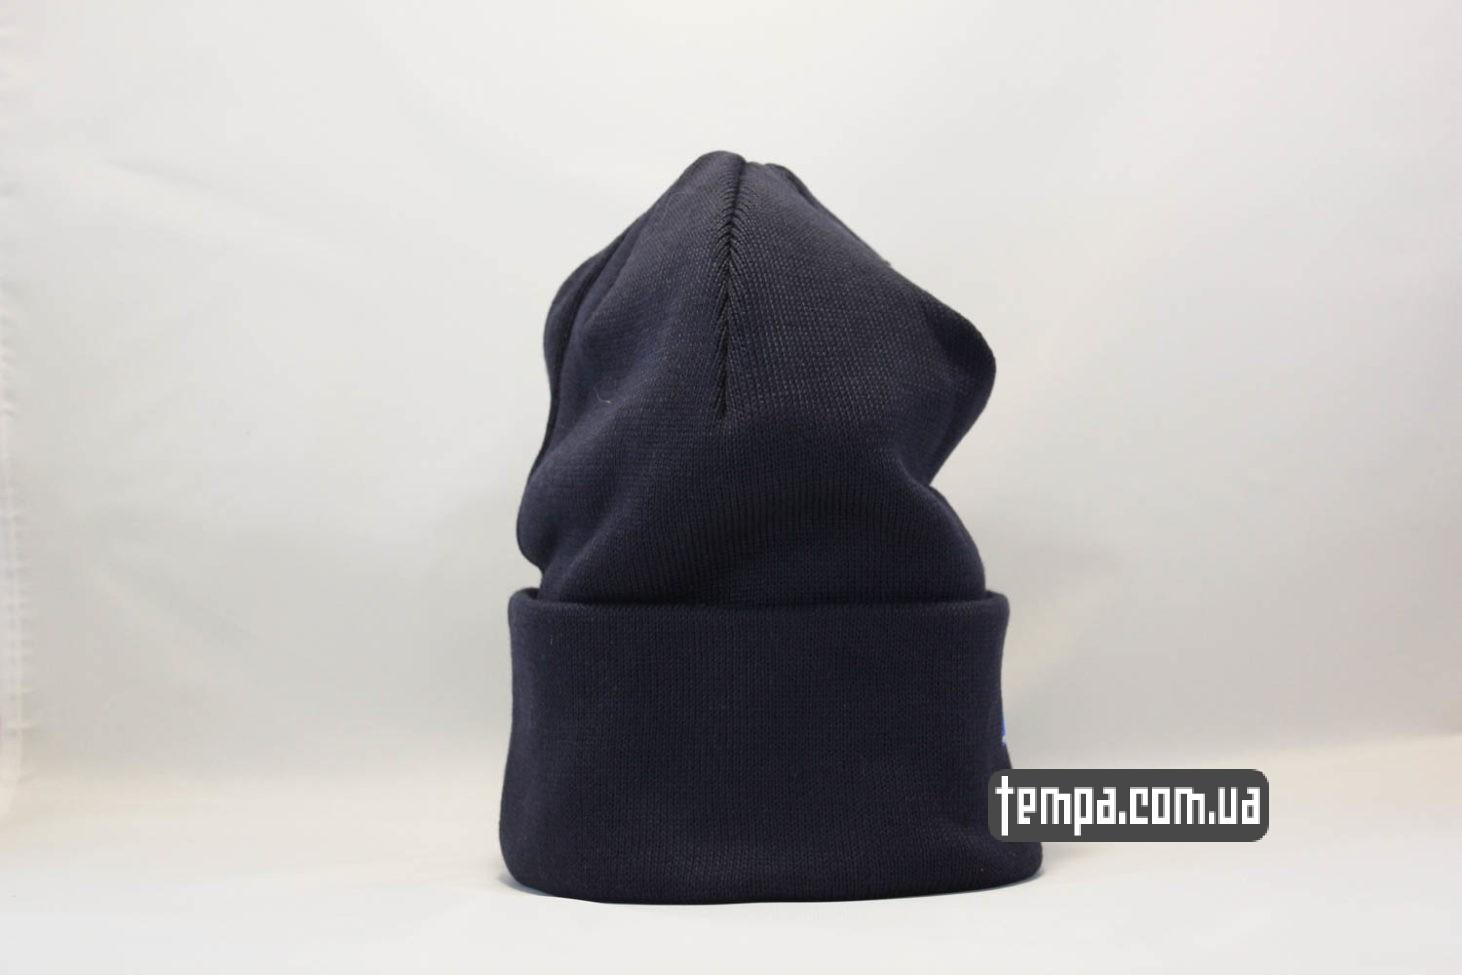 одежда дикис шапка beanie Dickies синяя купить Украина